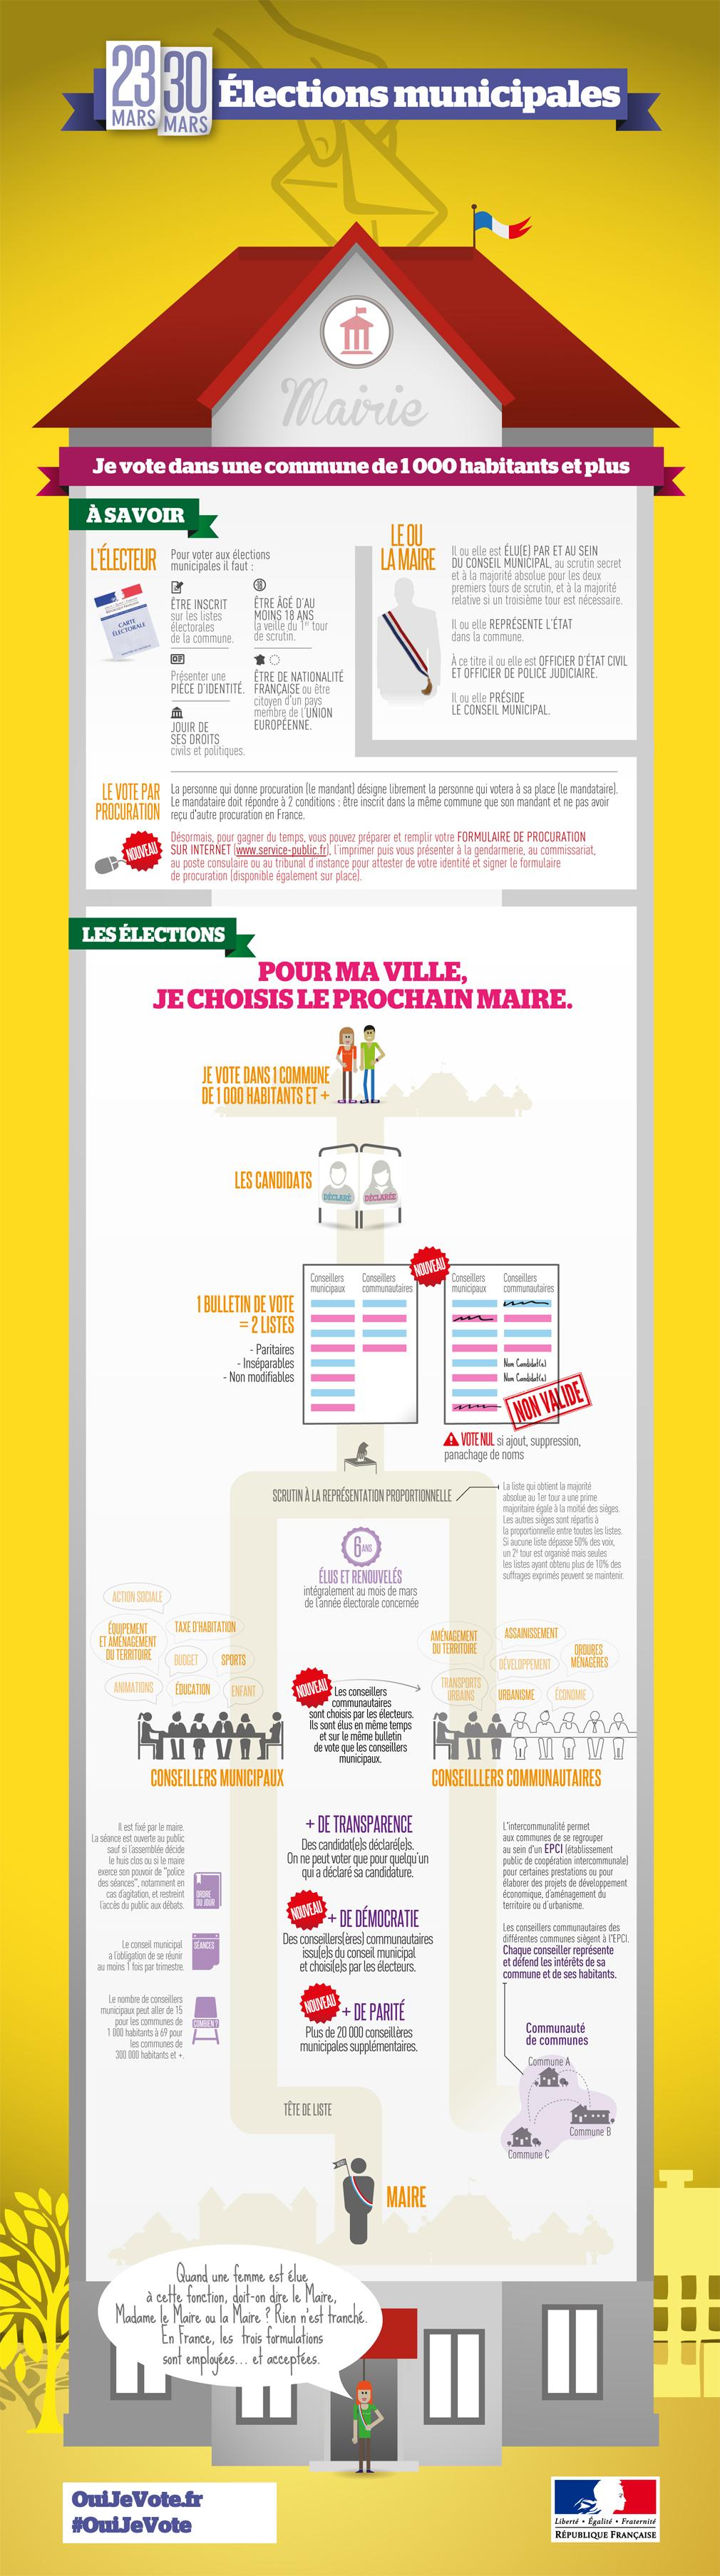 infographie-mille-habitants-et-plus.jpg